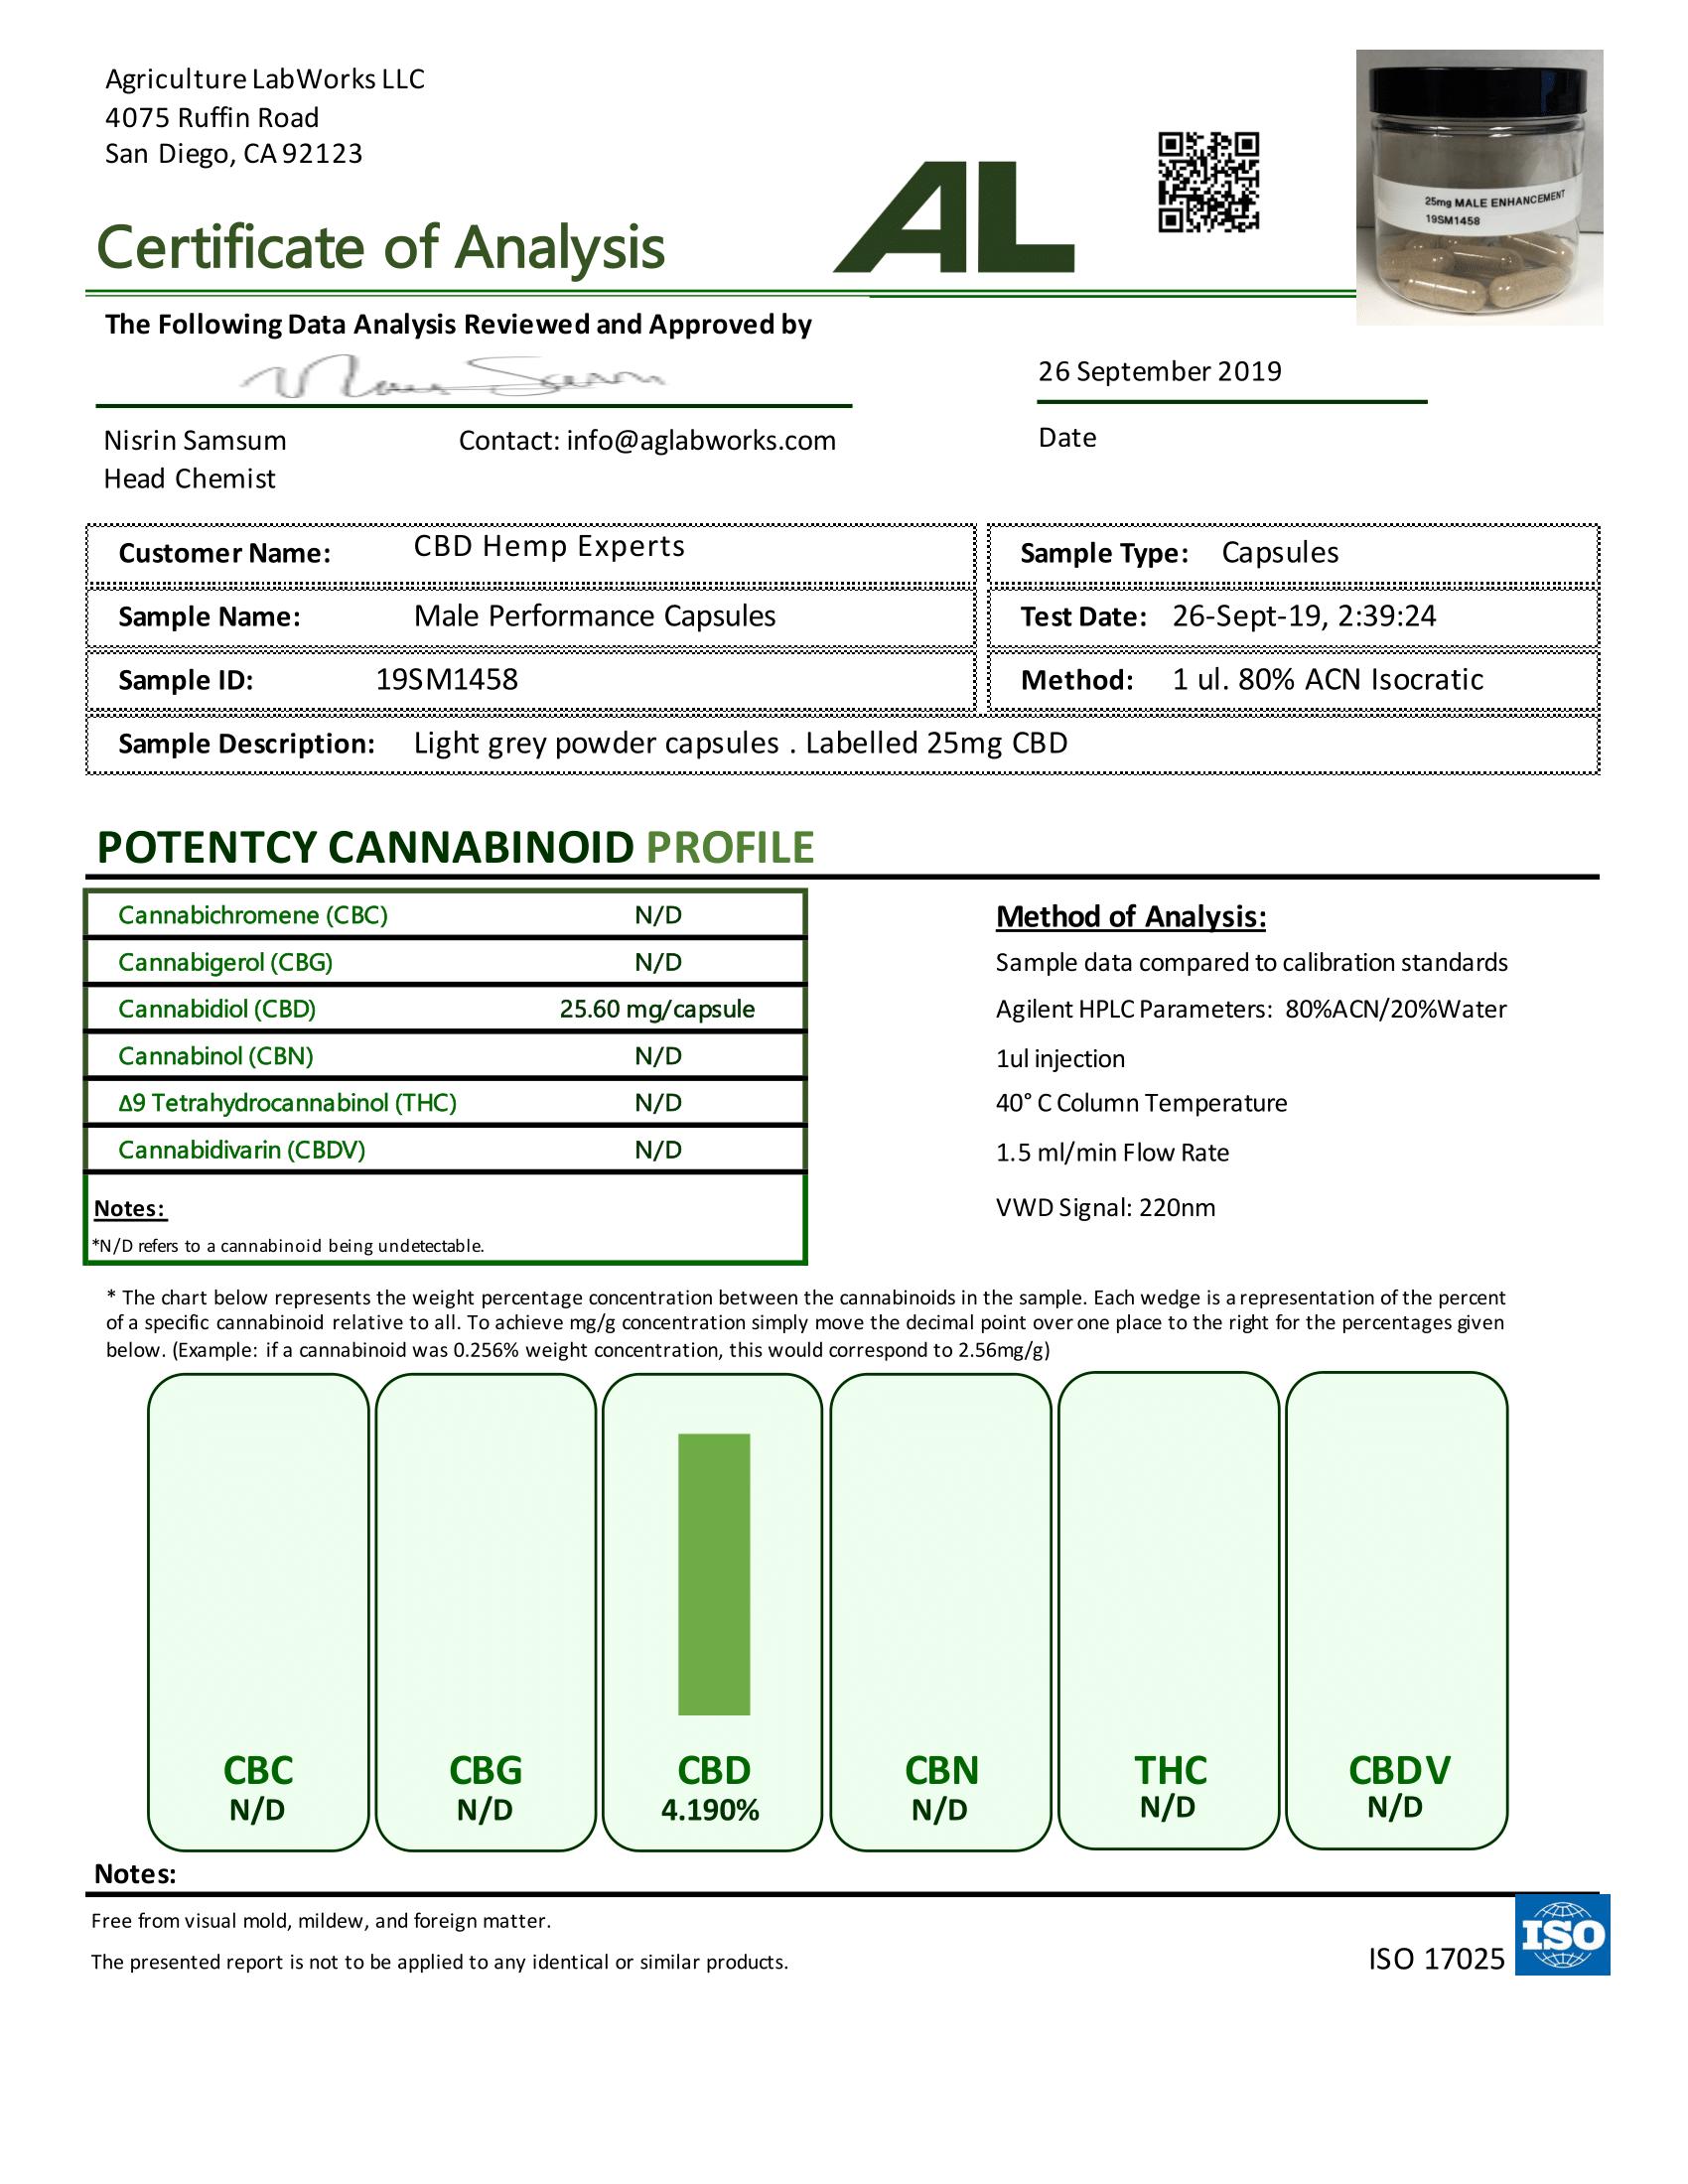 naysa CBD male performance capsules 25mg COA lab report